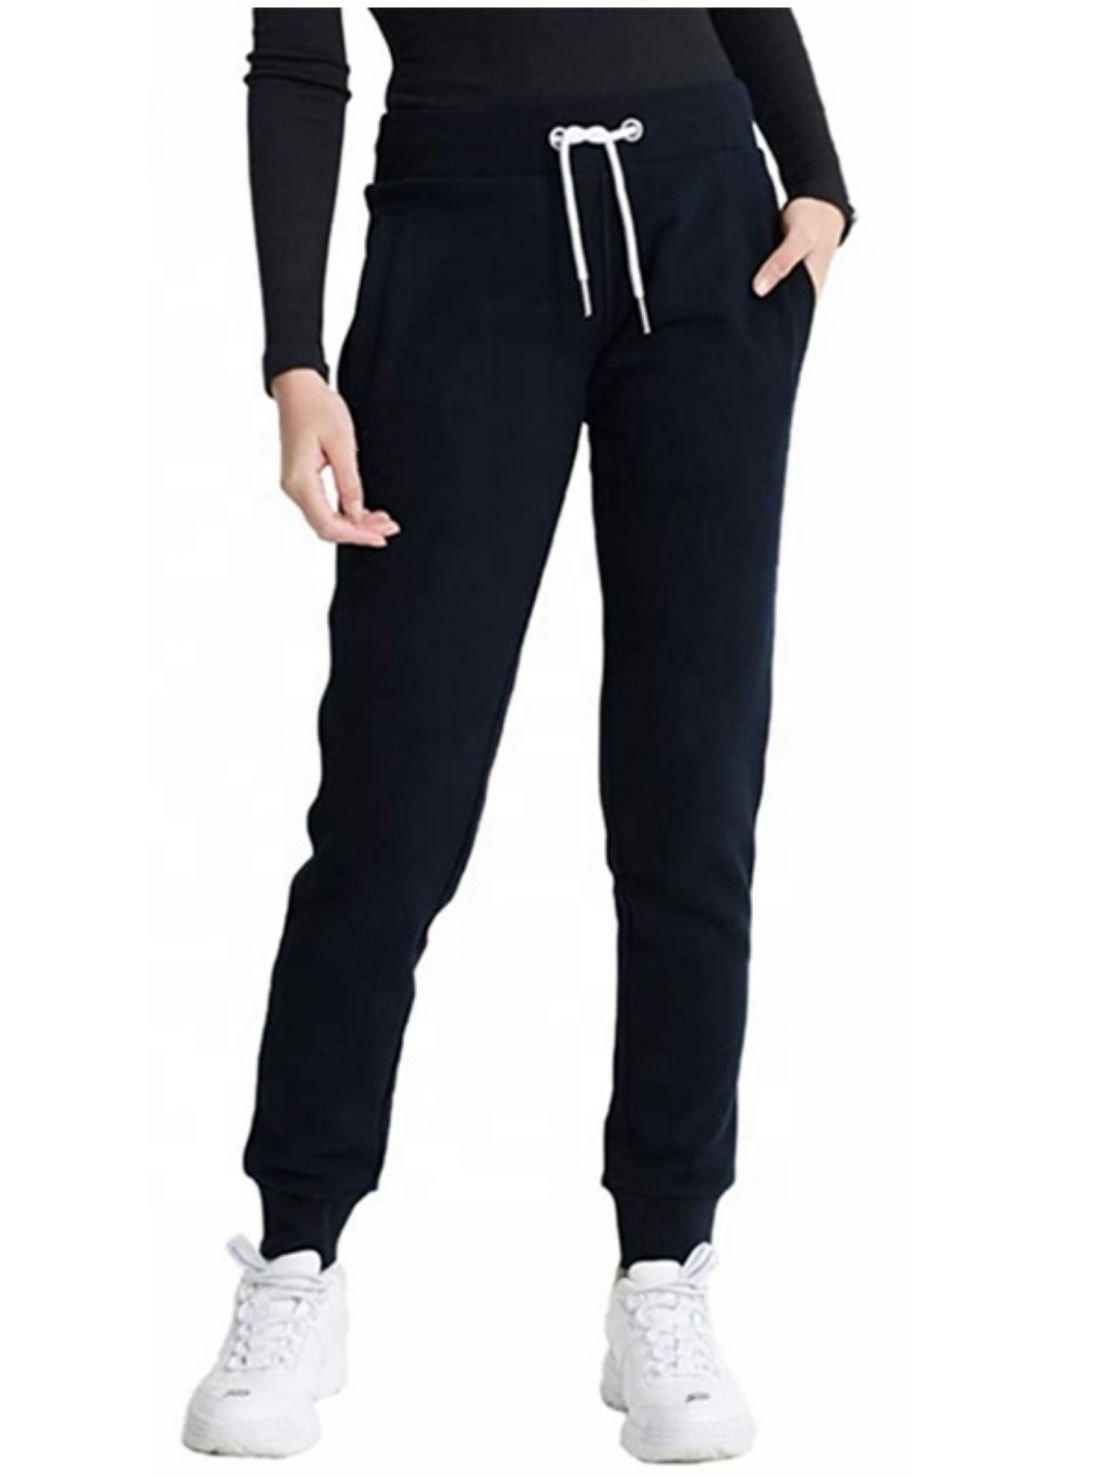 Wholesales Ladies Pants Cropped Trousers